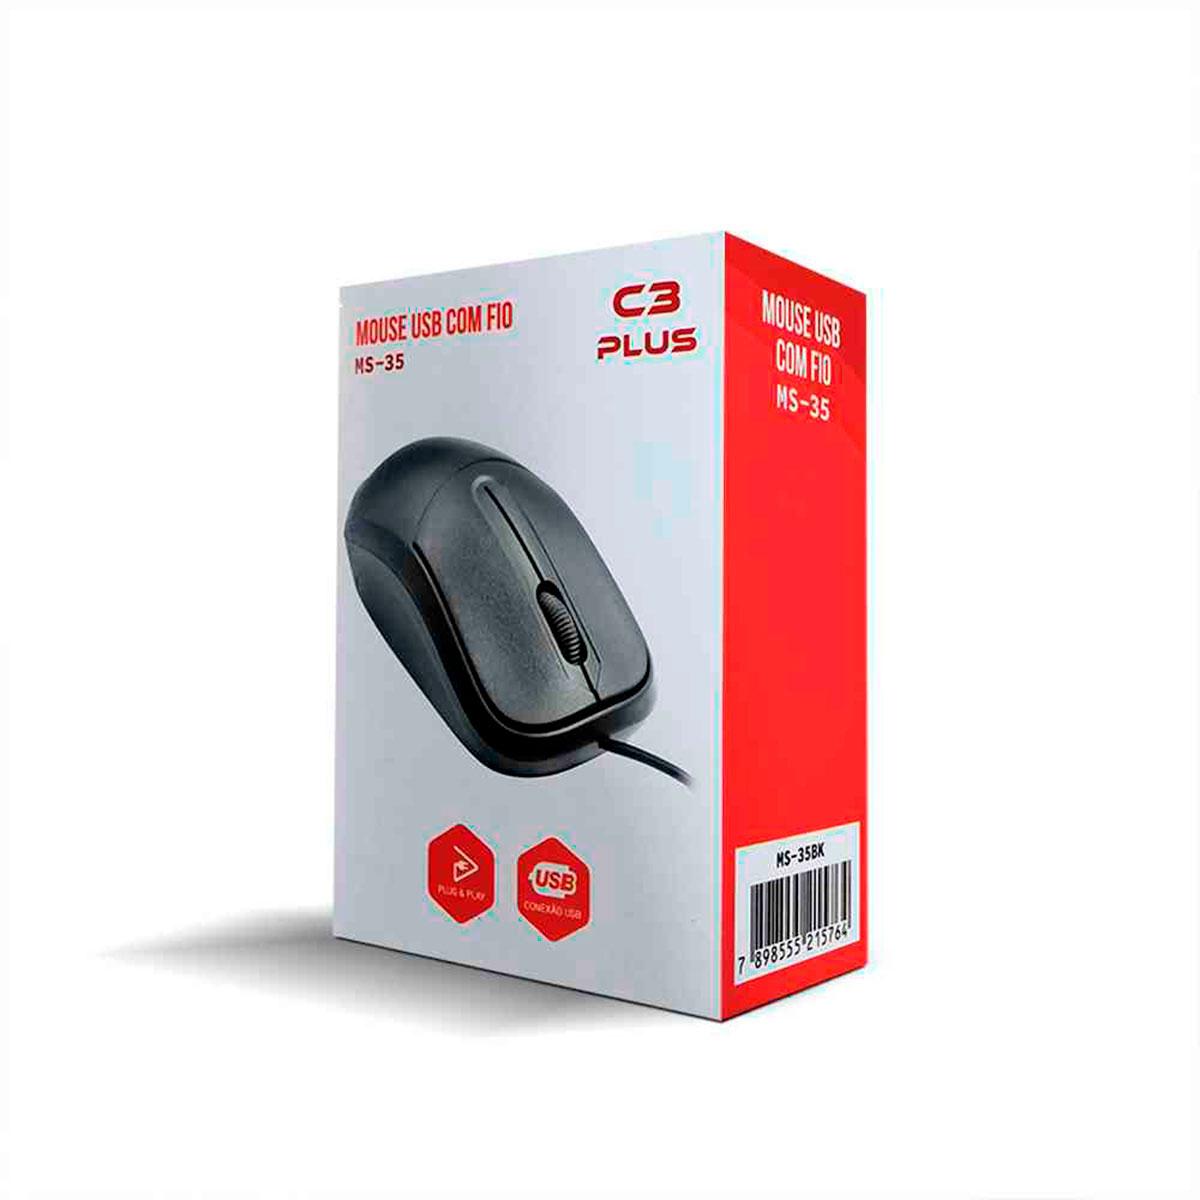 Mouse C3Tech C3Plus MS-35BK Padrão USB 1000 DPI Preto